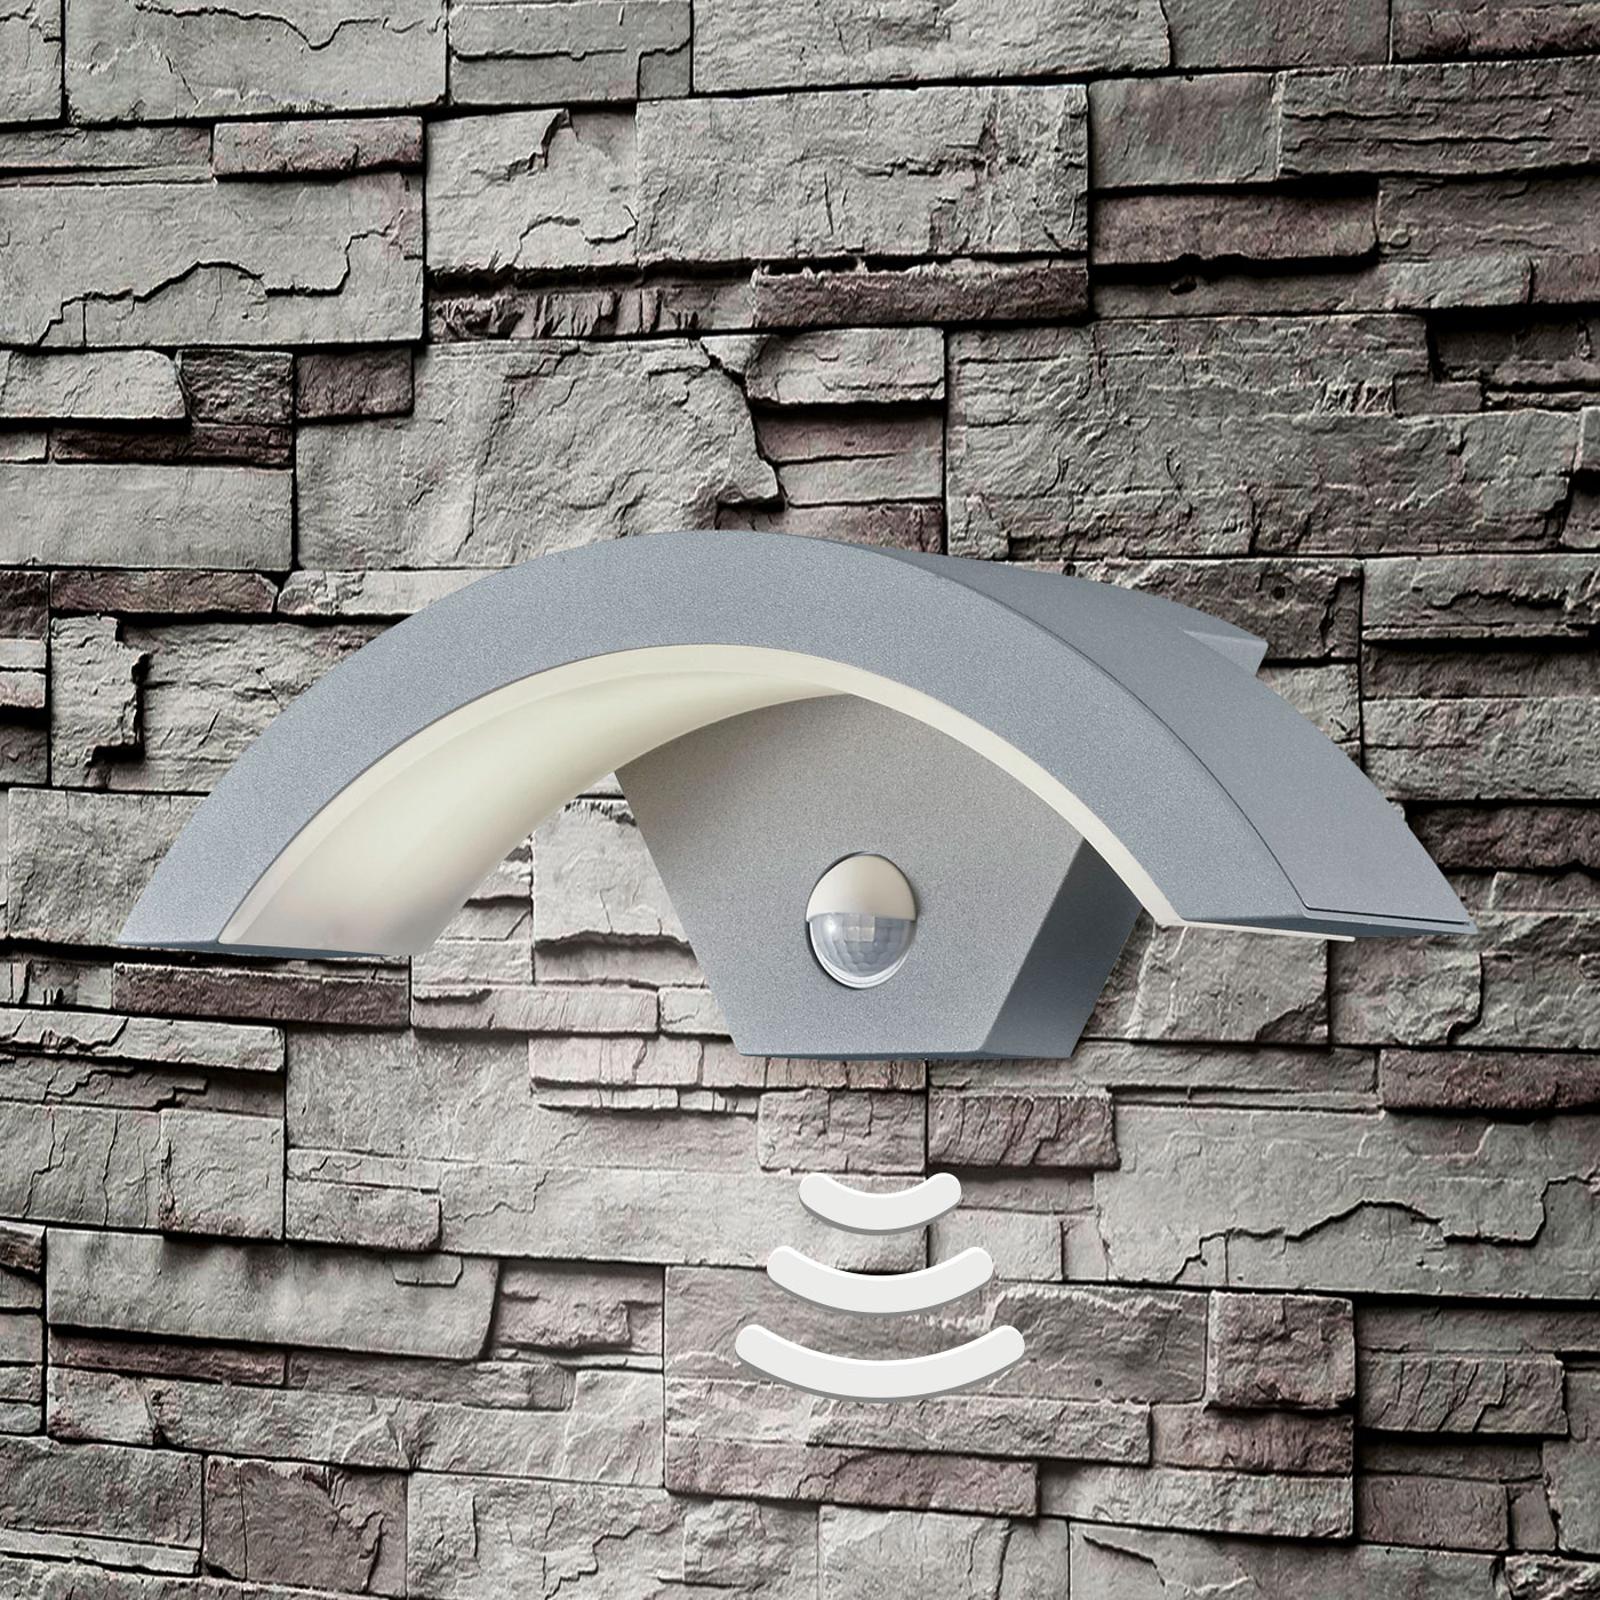 Titanfarbige LED-Außenwandleuchte Ohio m. Sensor